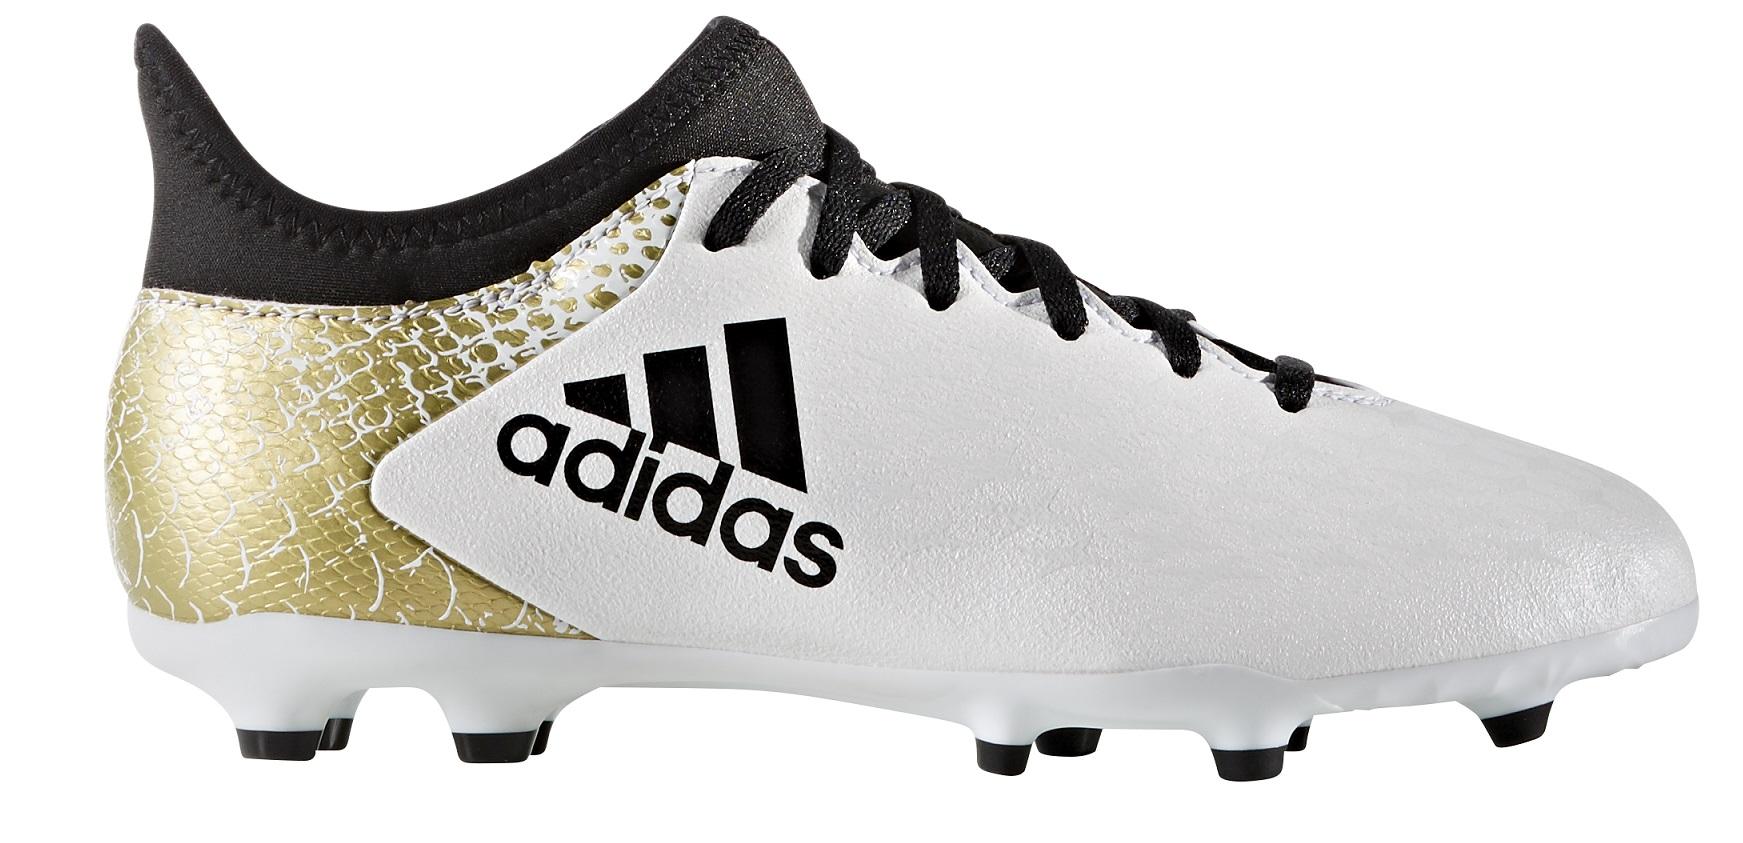 Botas de fútbol de Niño Adidas X 16 b8c2c35c2f3ee